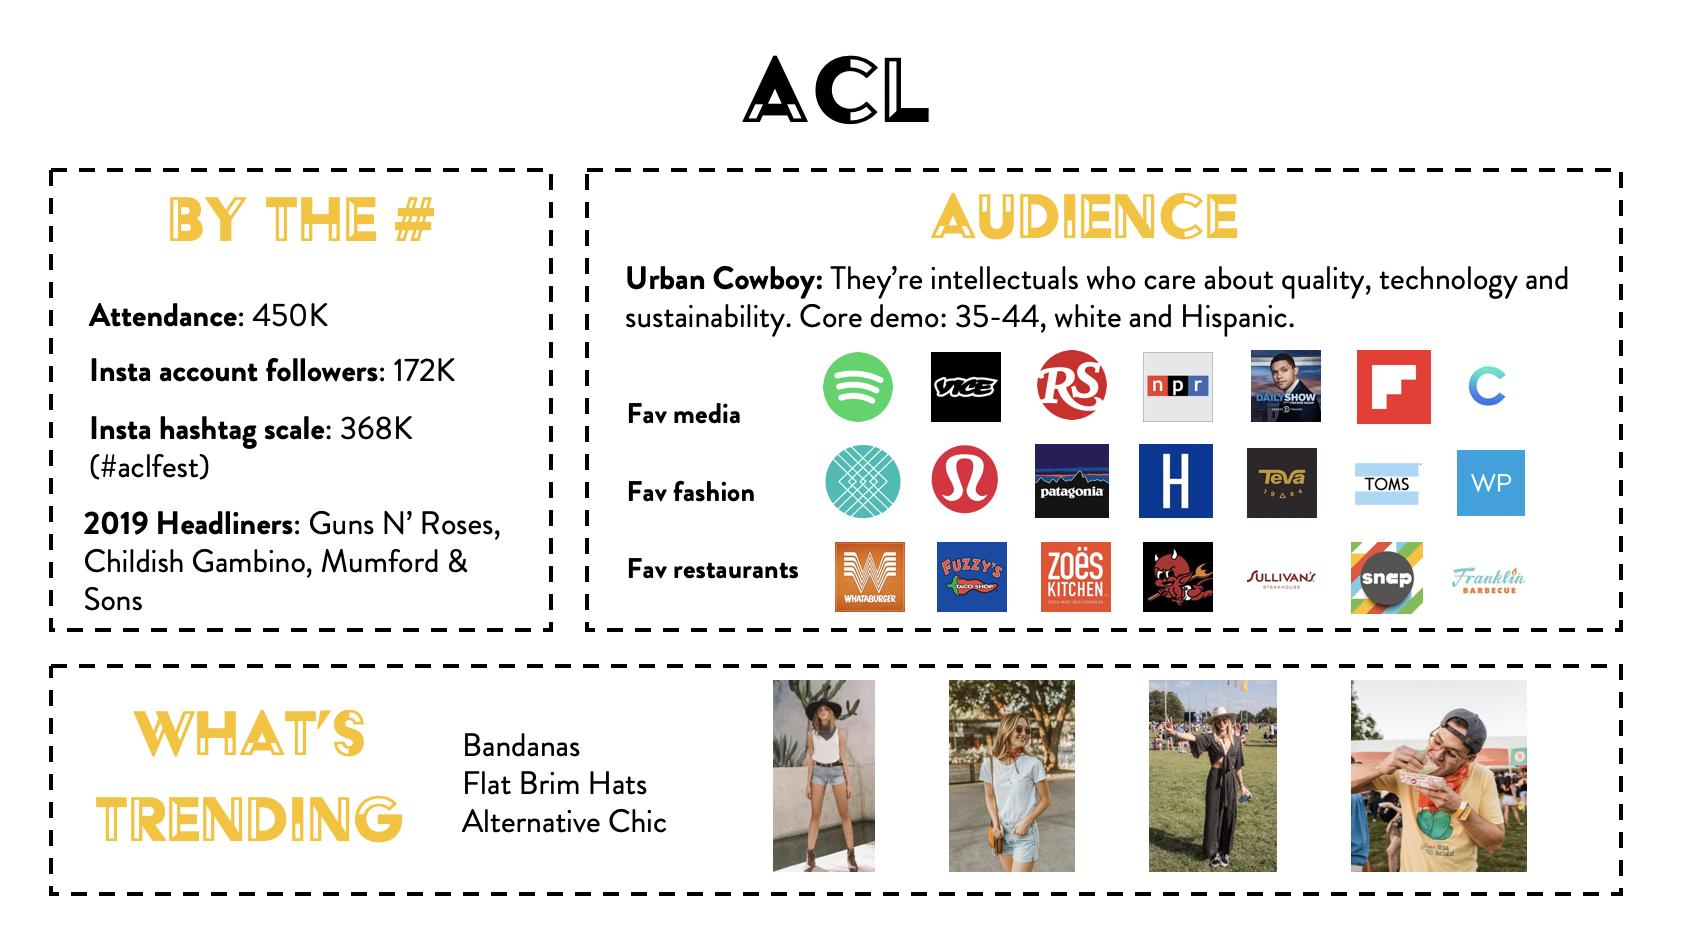 Helixa   ,    Pinterest   ,    Instagram   ,    Attendance